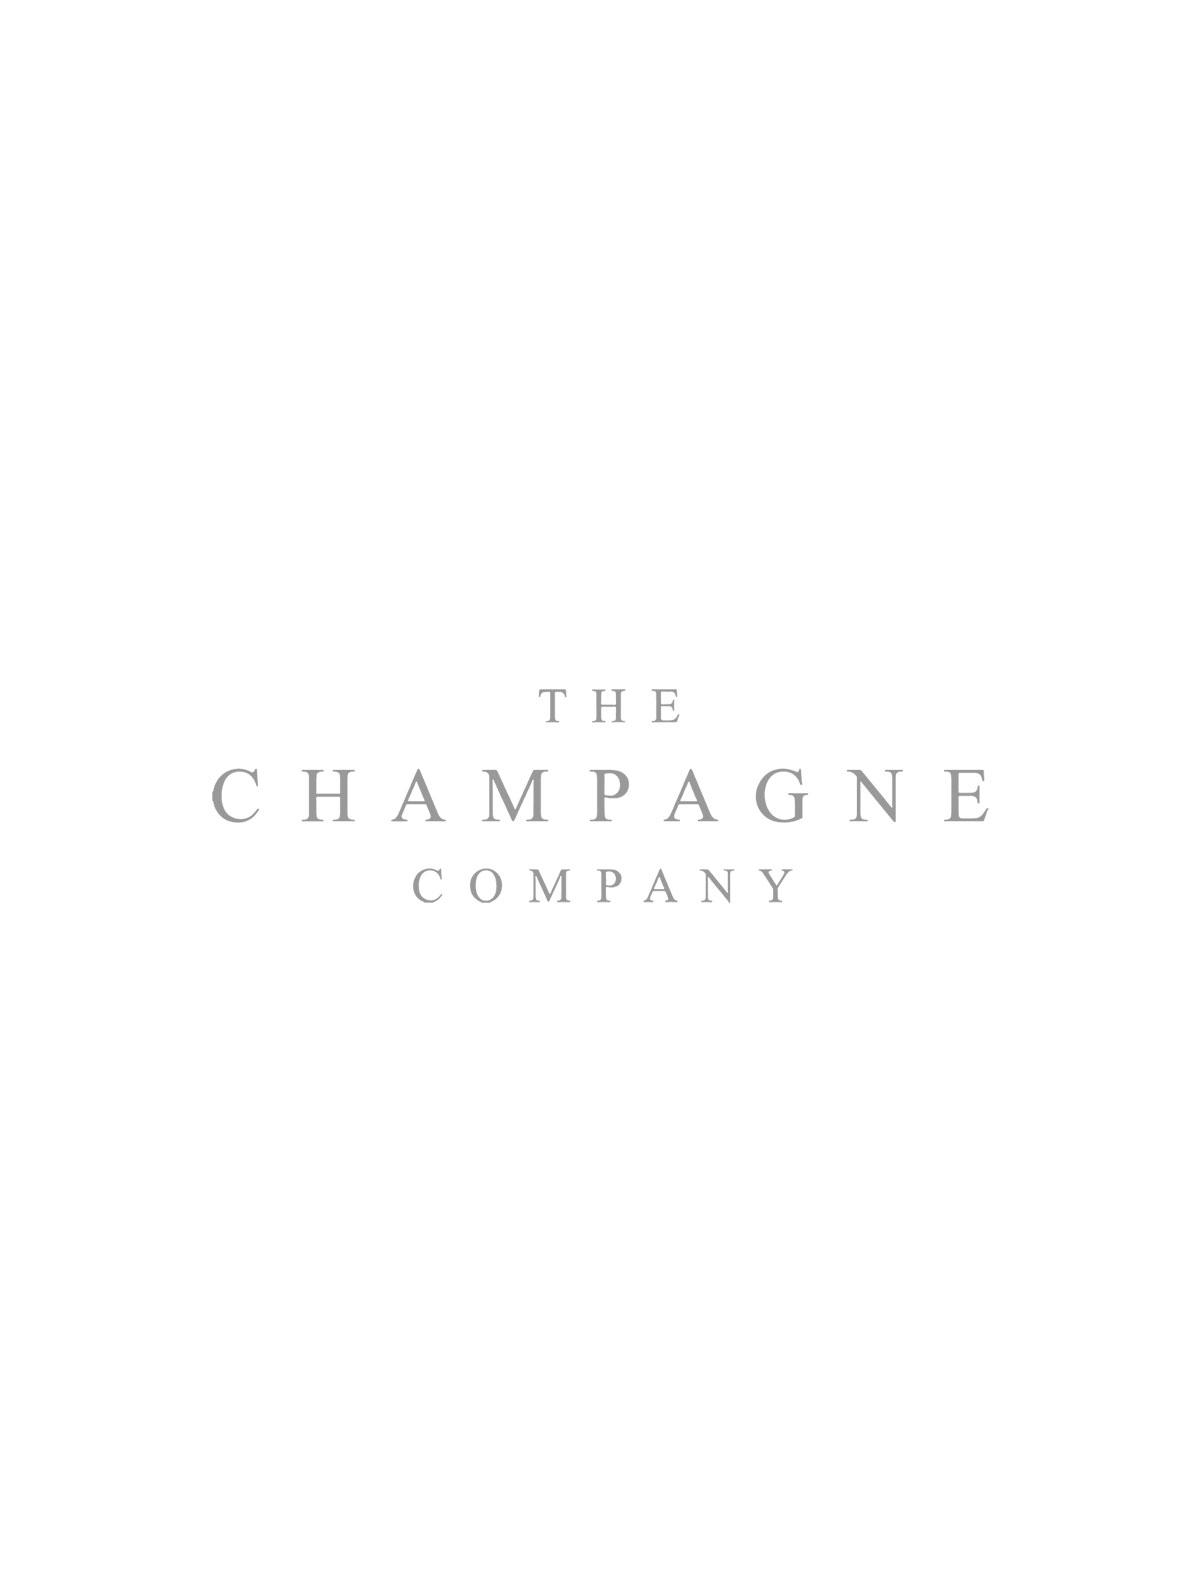 Chateau Guiraud Sauternes Organic White Wine France 2012 75cl